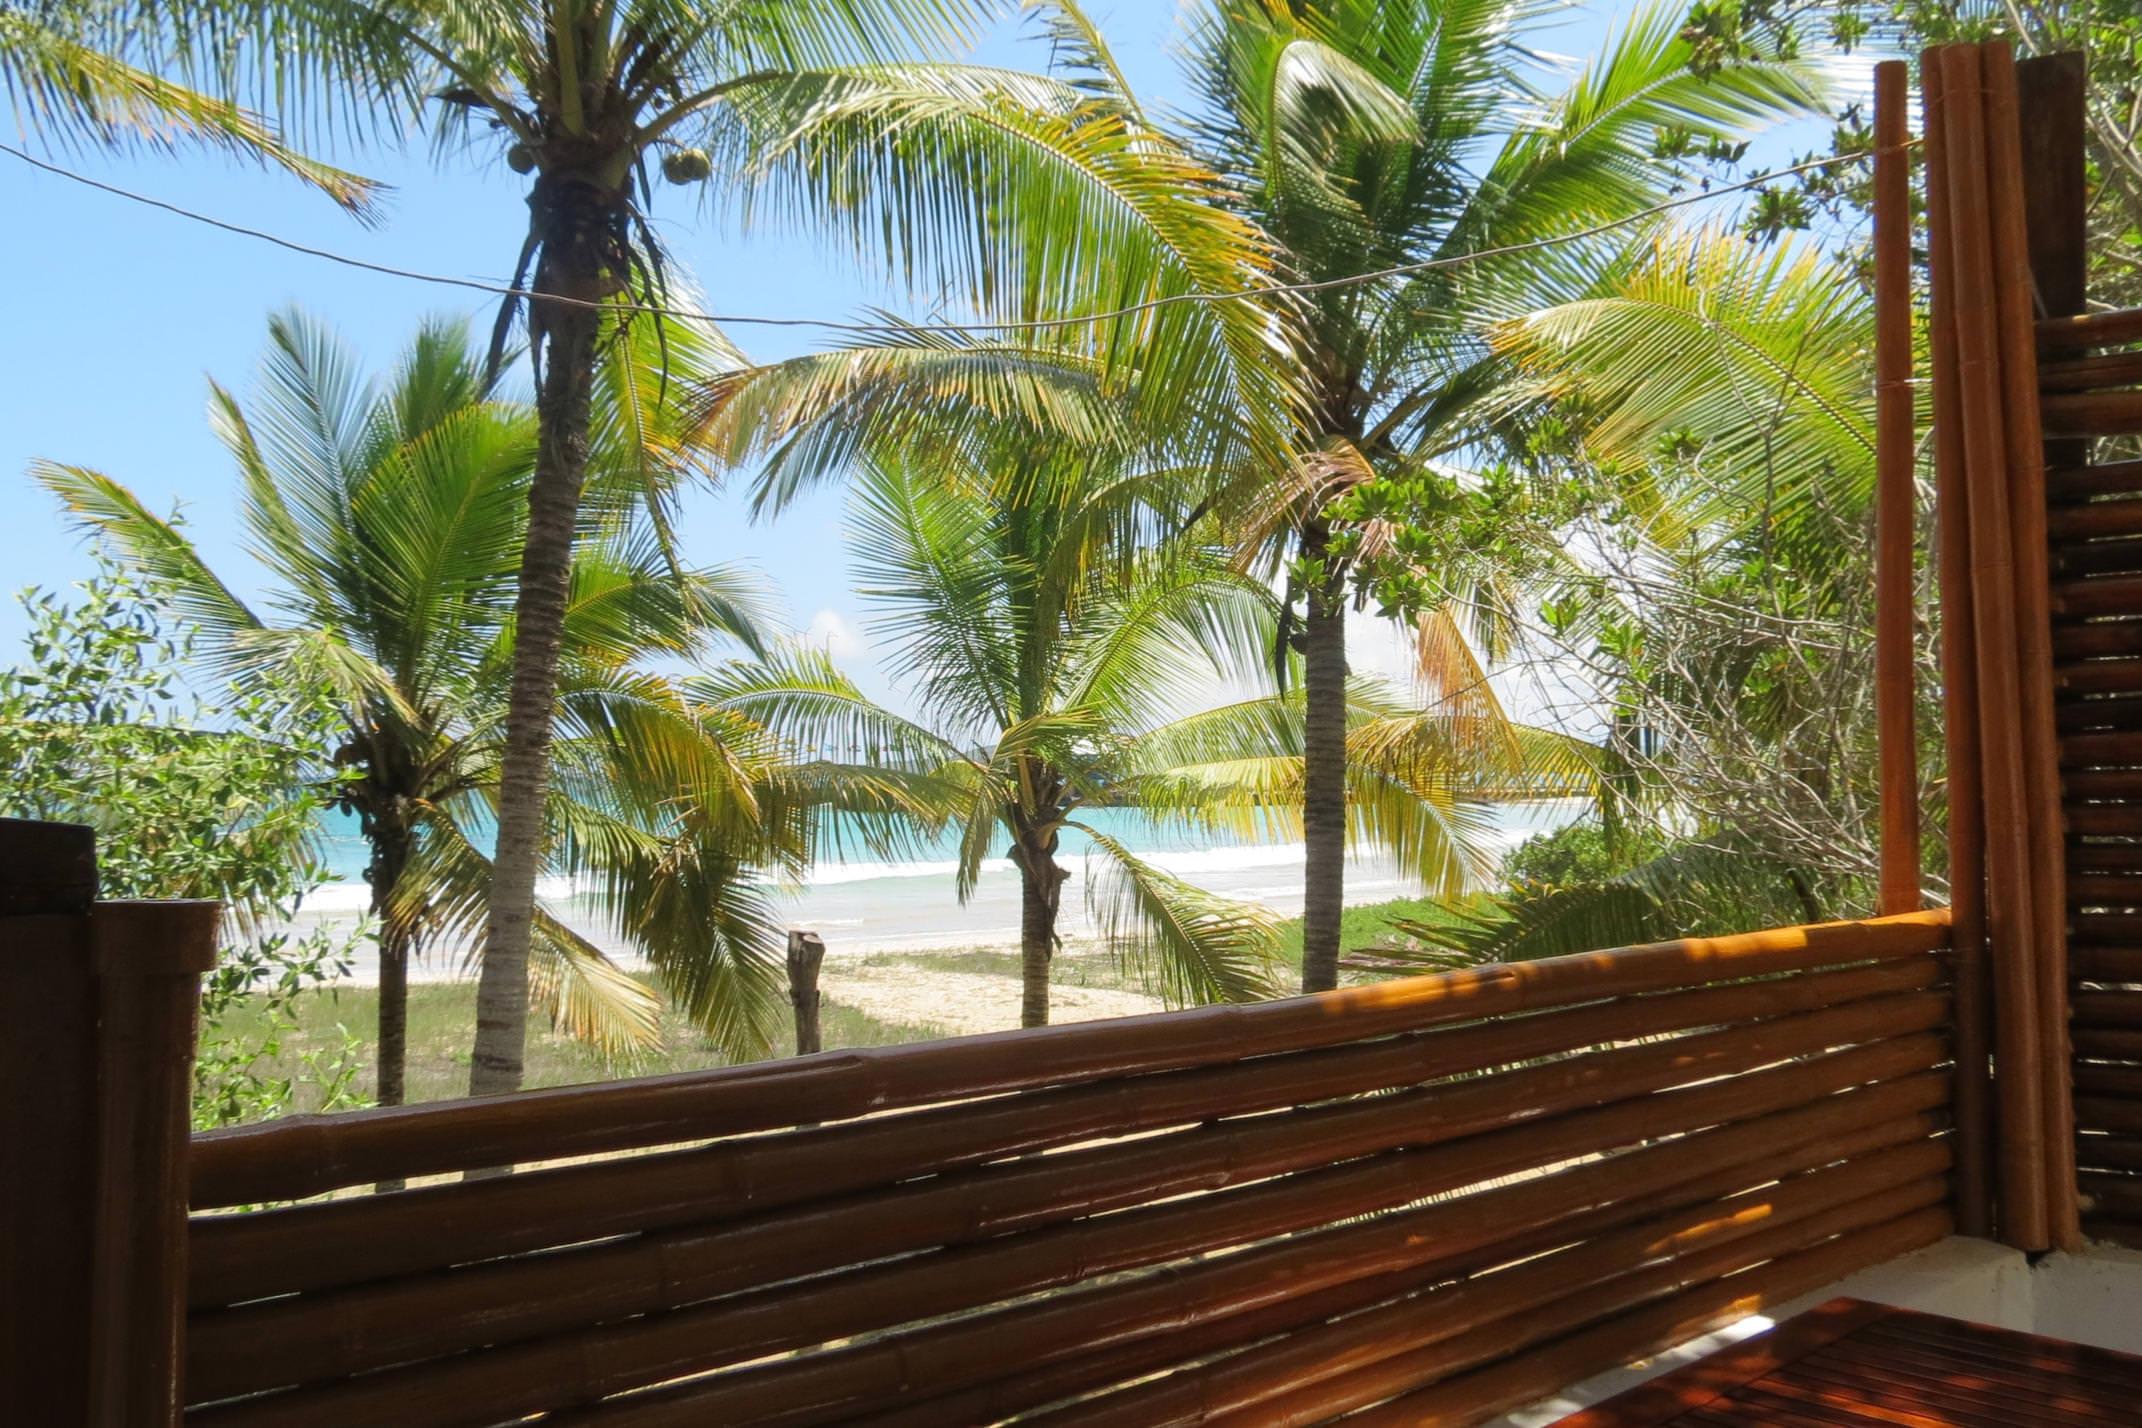 Ecuador galapagos islands isabela casa marita hotel balcony